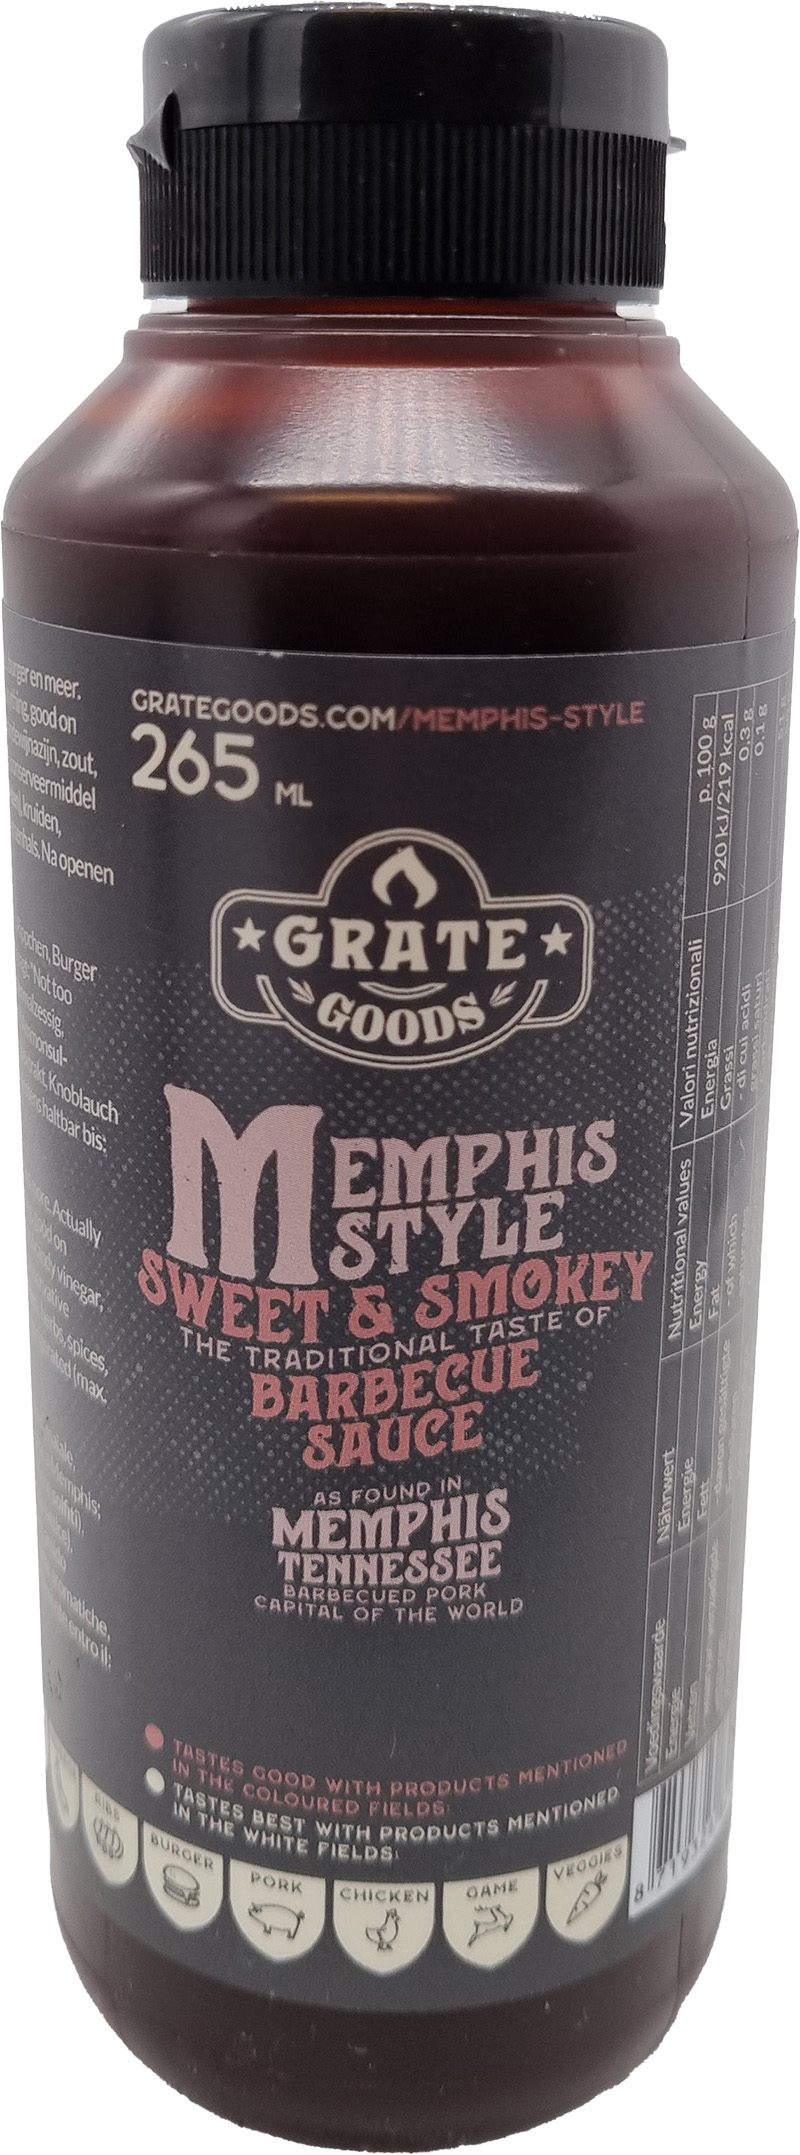 Grate Goods Memphis Sweet & Smokey BBQ Sauce 265ml